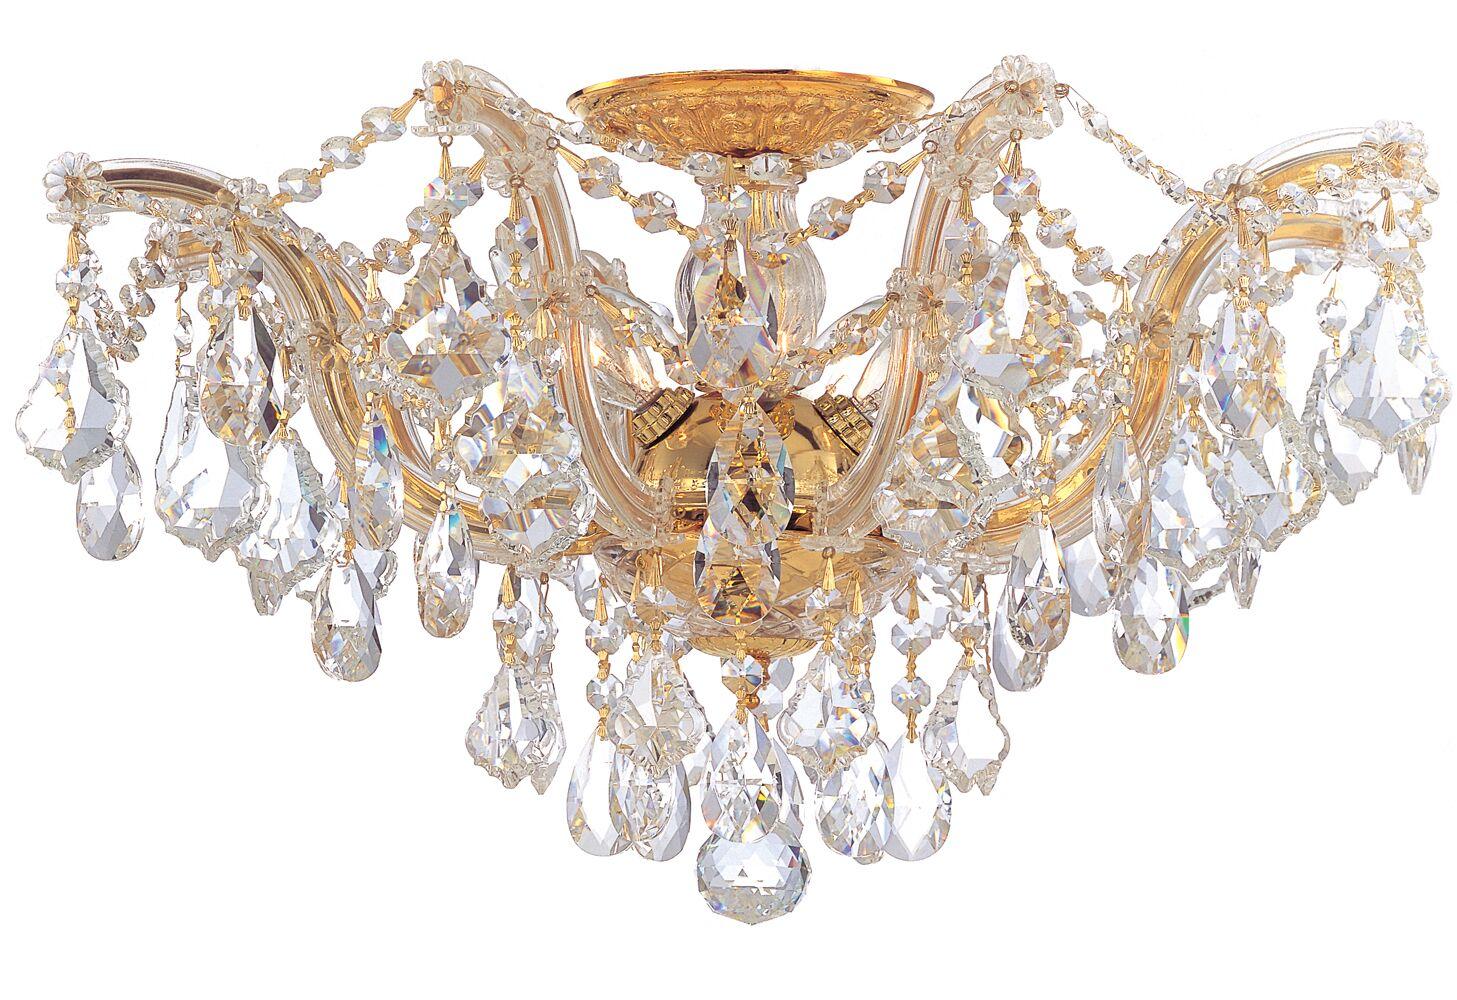 Griffiths 5-Light Semi Flush Mount Crystal Type: Swarovski Spectra, Finish: Polished Gold